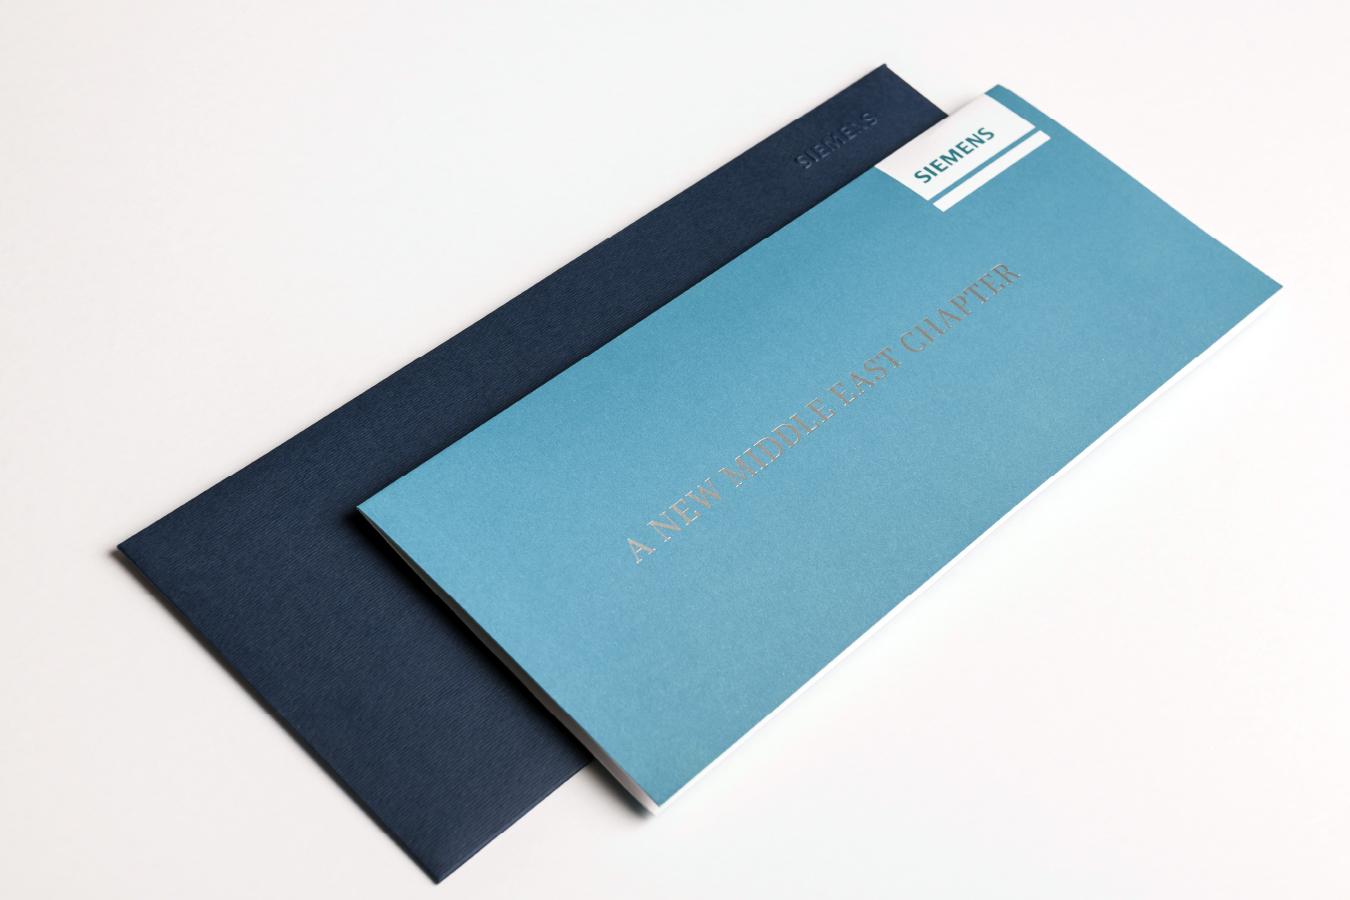 simens-invitation.jpg